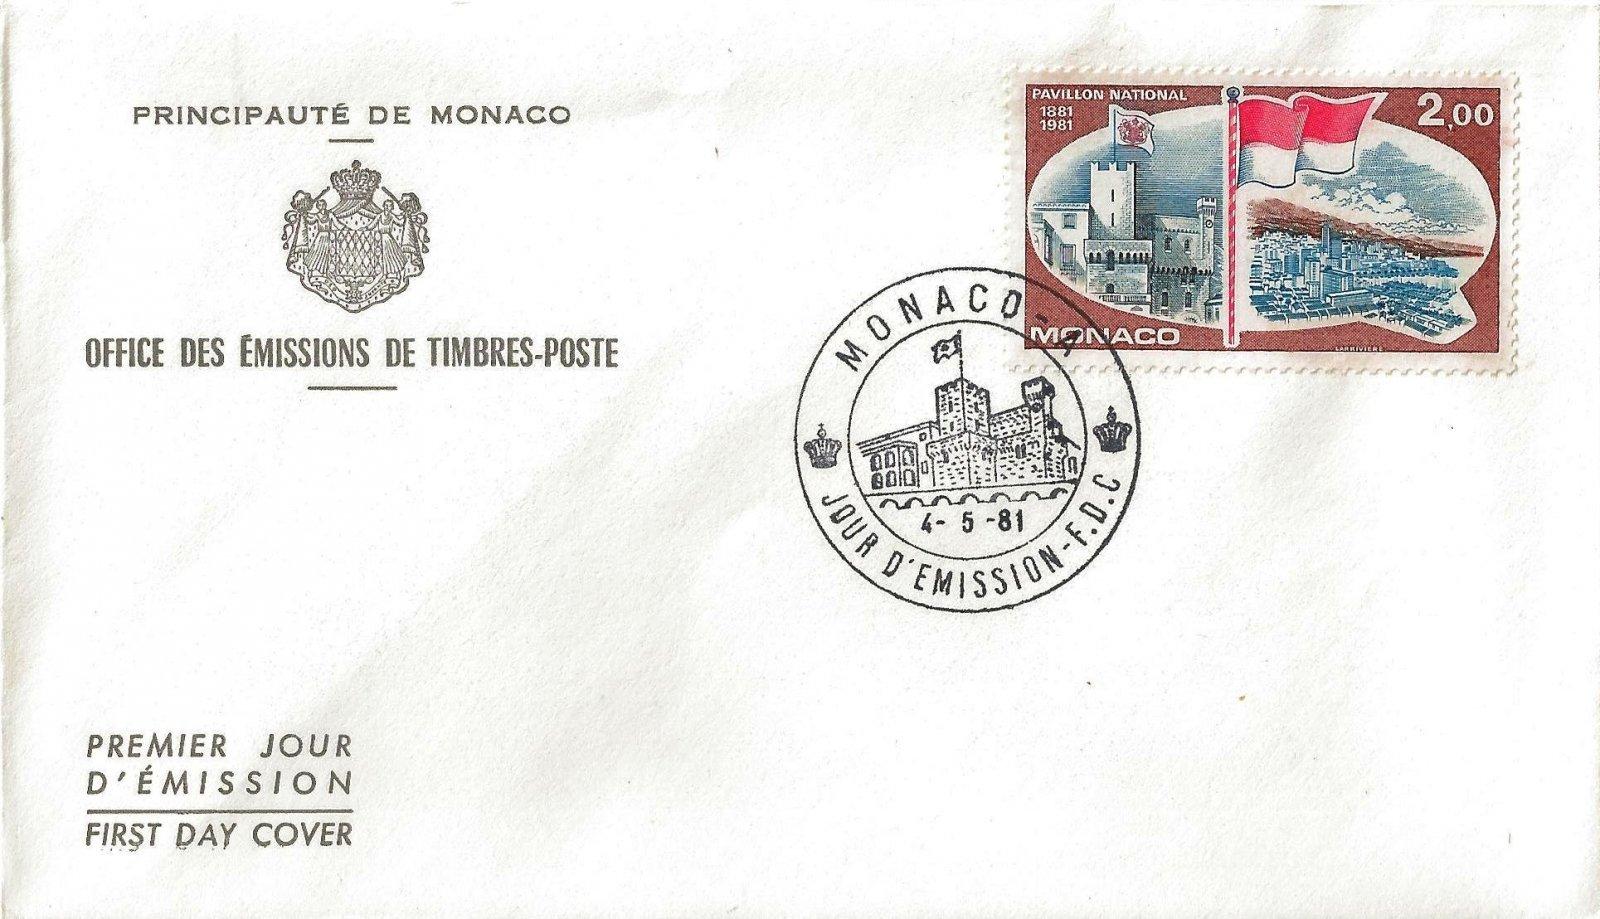 1981 PAVILLON NATIONAL MONACO